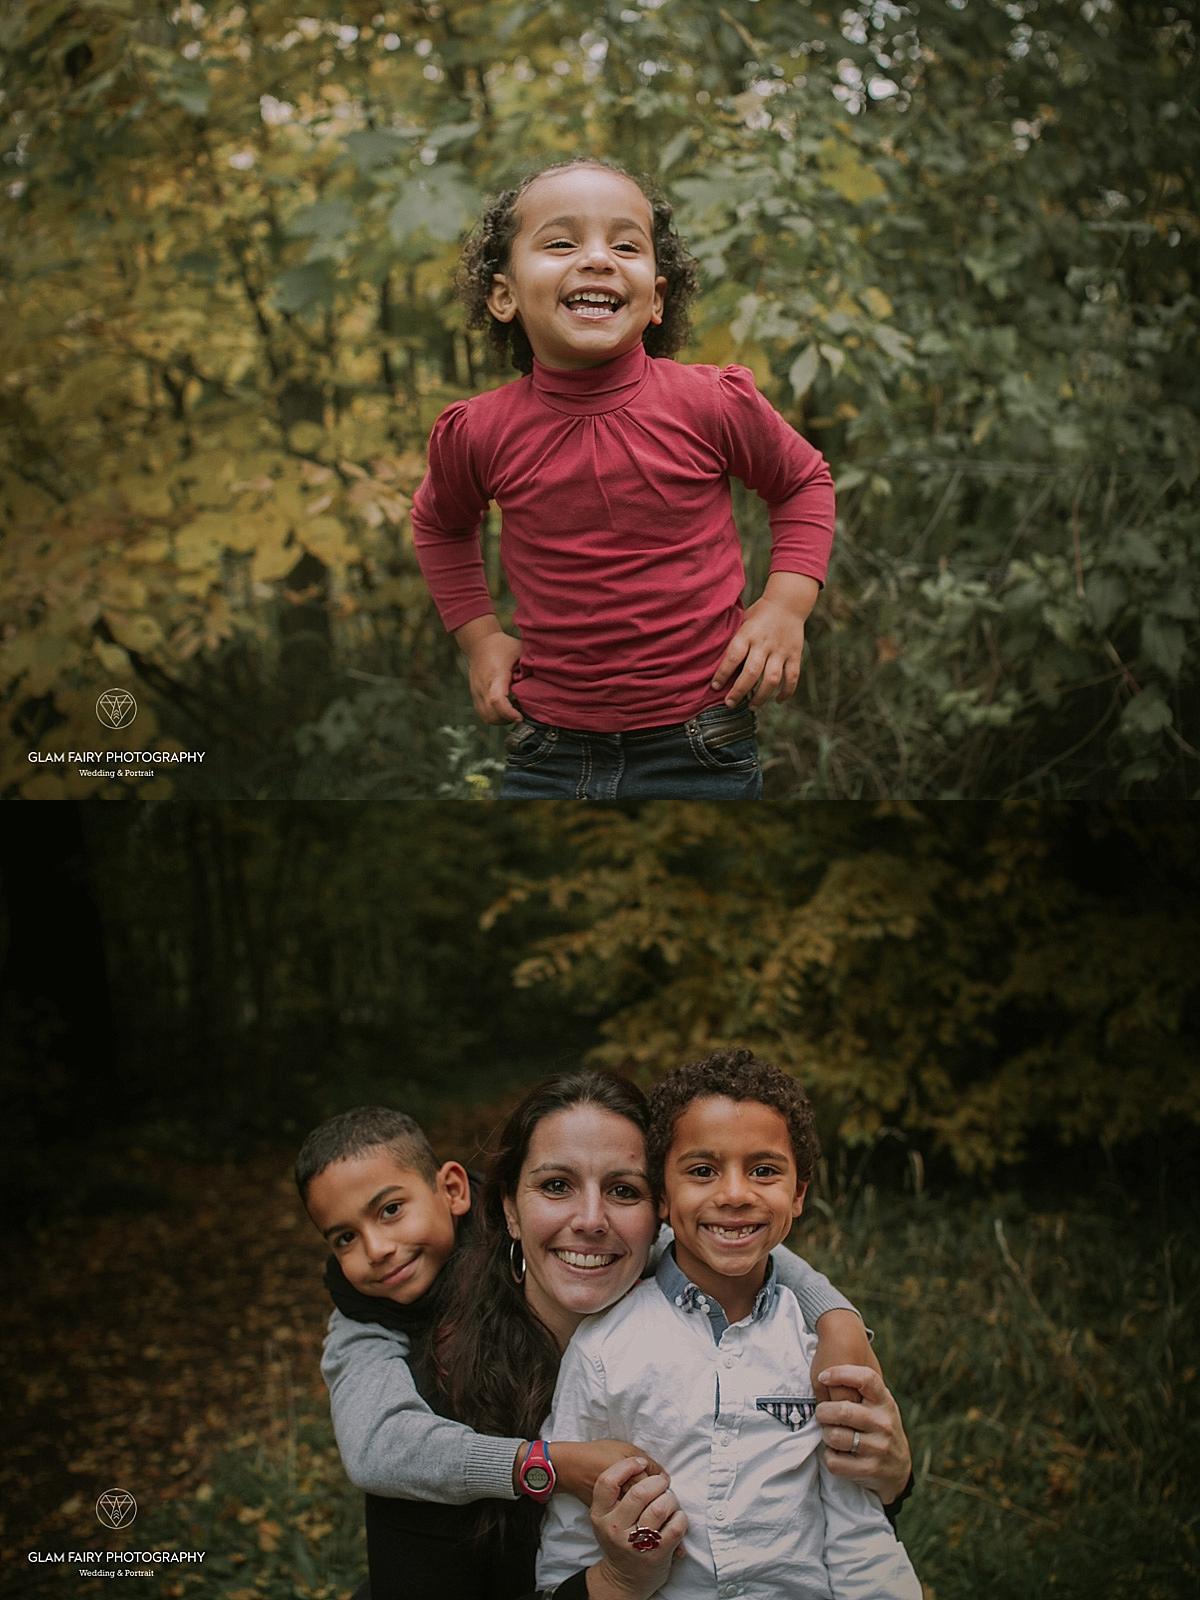 GlamFairyPhotography-mini-session-famille-a-vincennes-caroline_0006